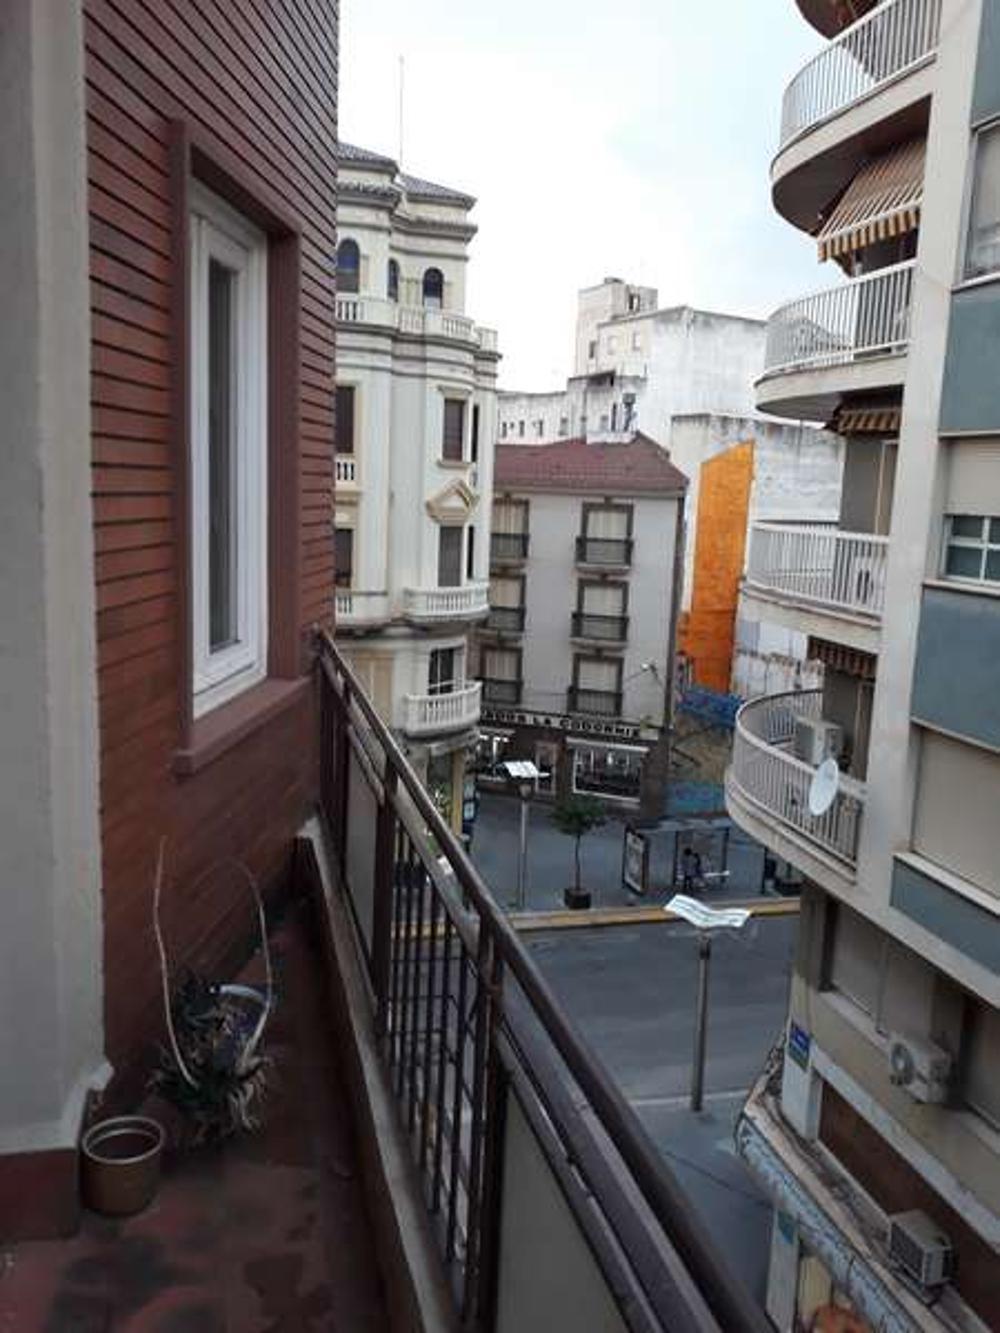 linares jaén apartment foto 3054787